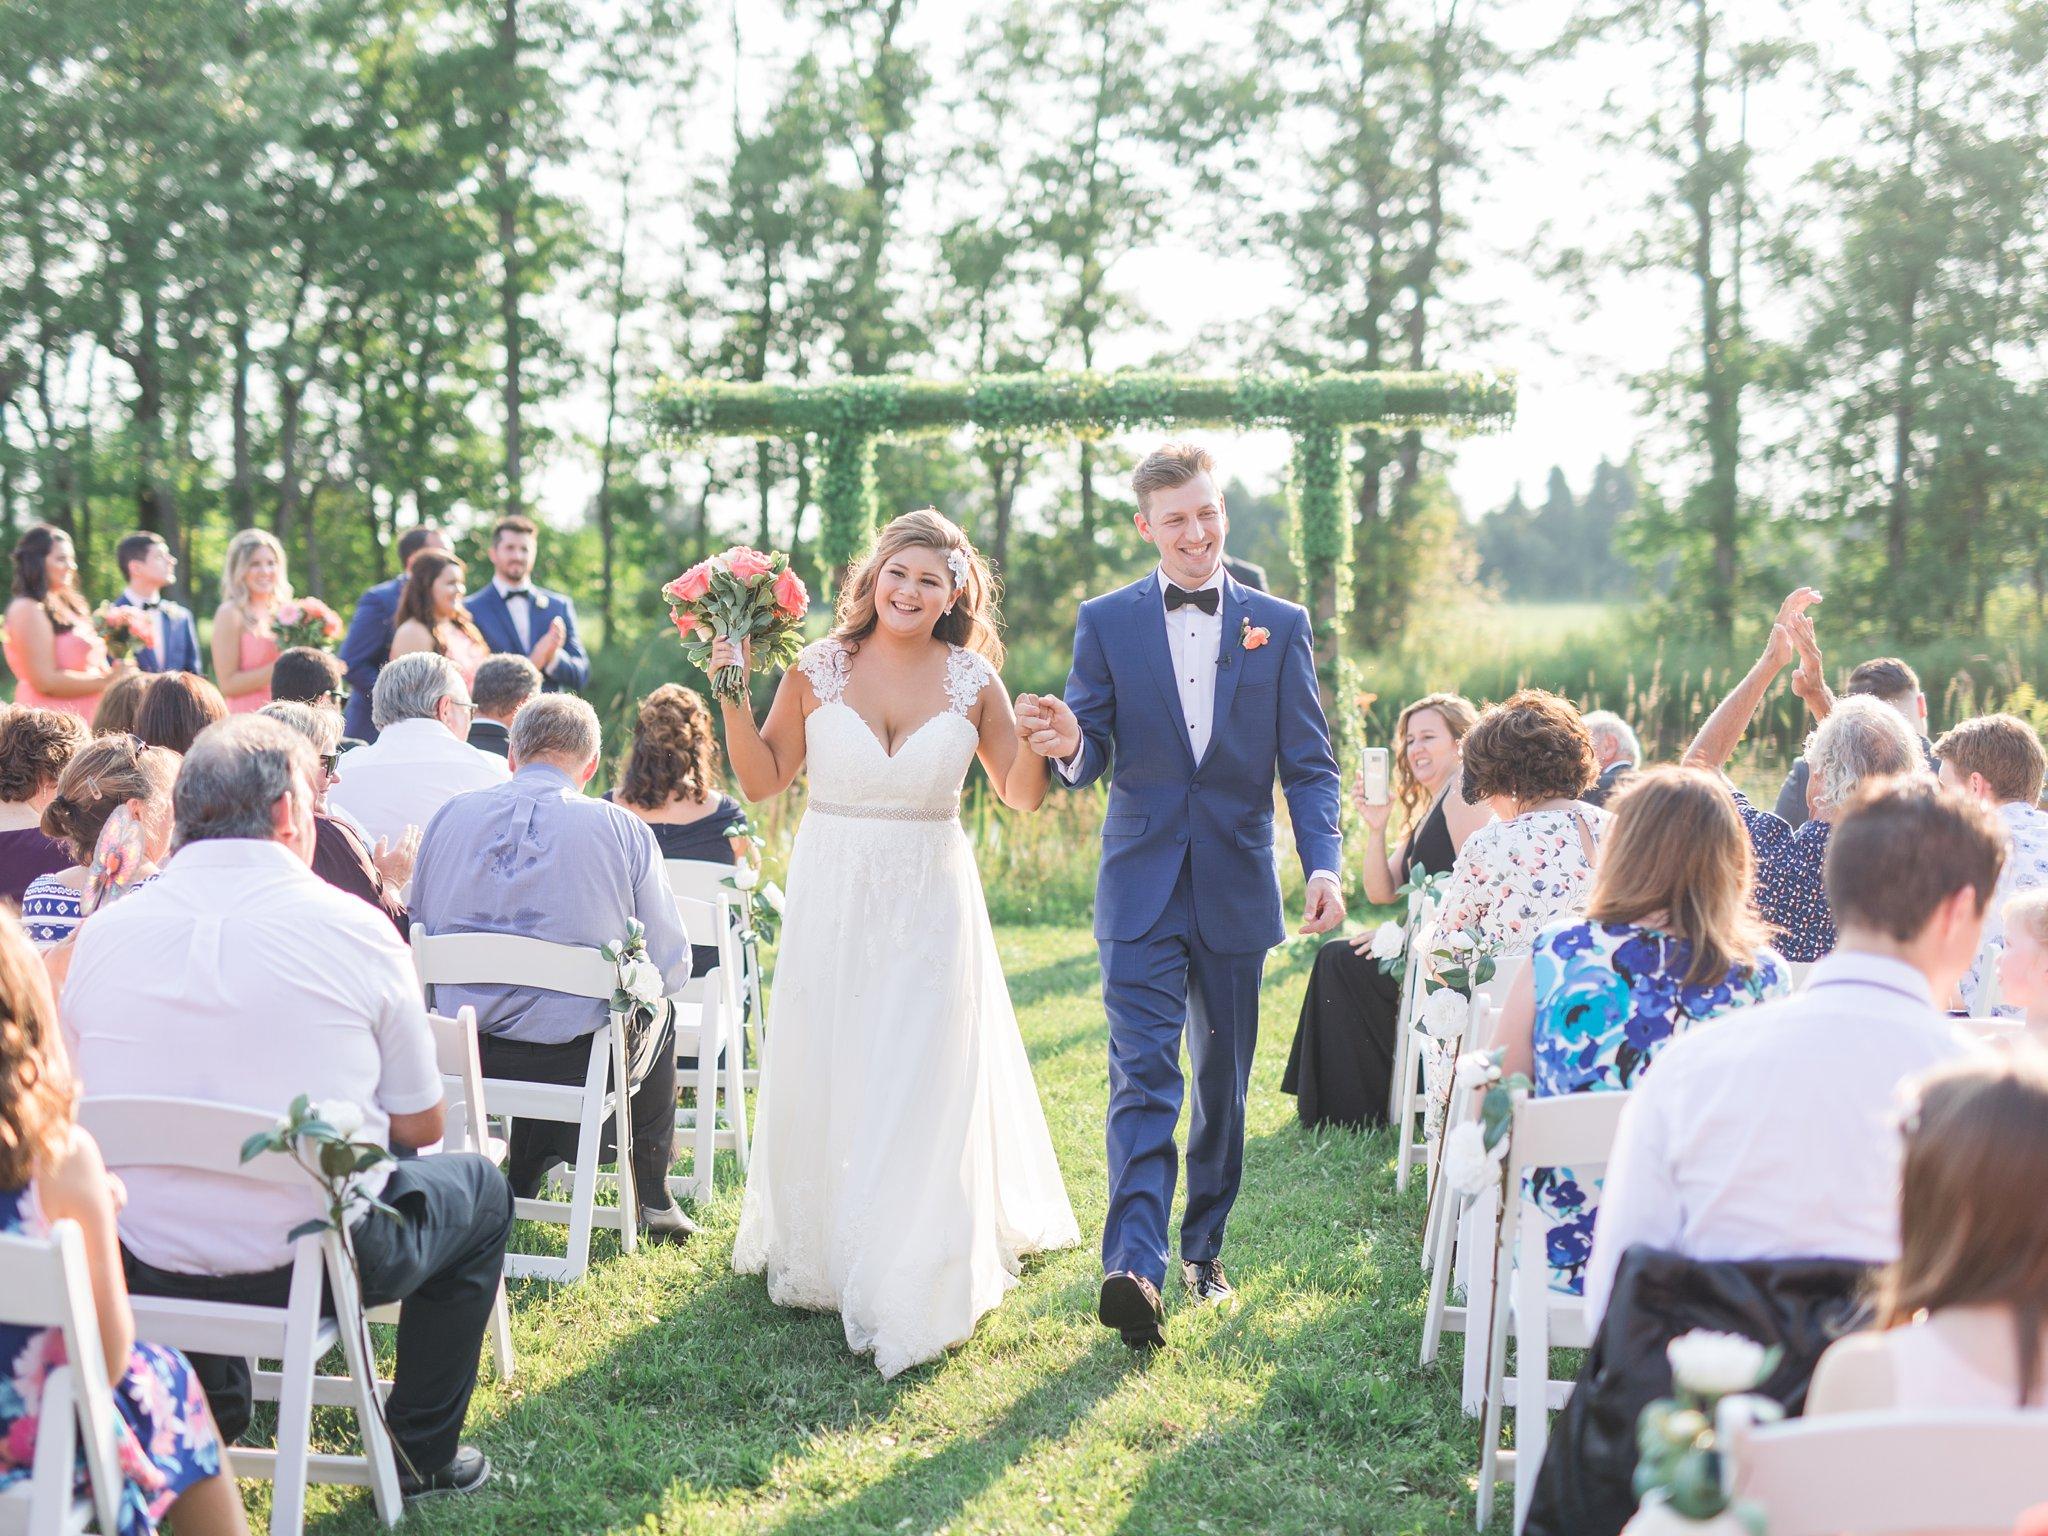 Recessional Vineyard wedding at Jabulani Amy Pinder Photography